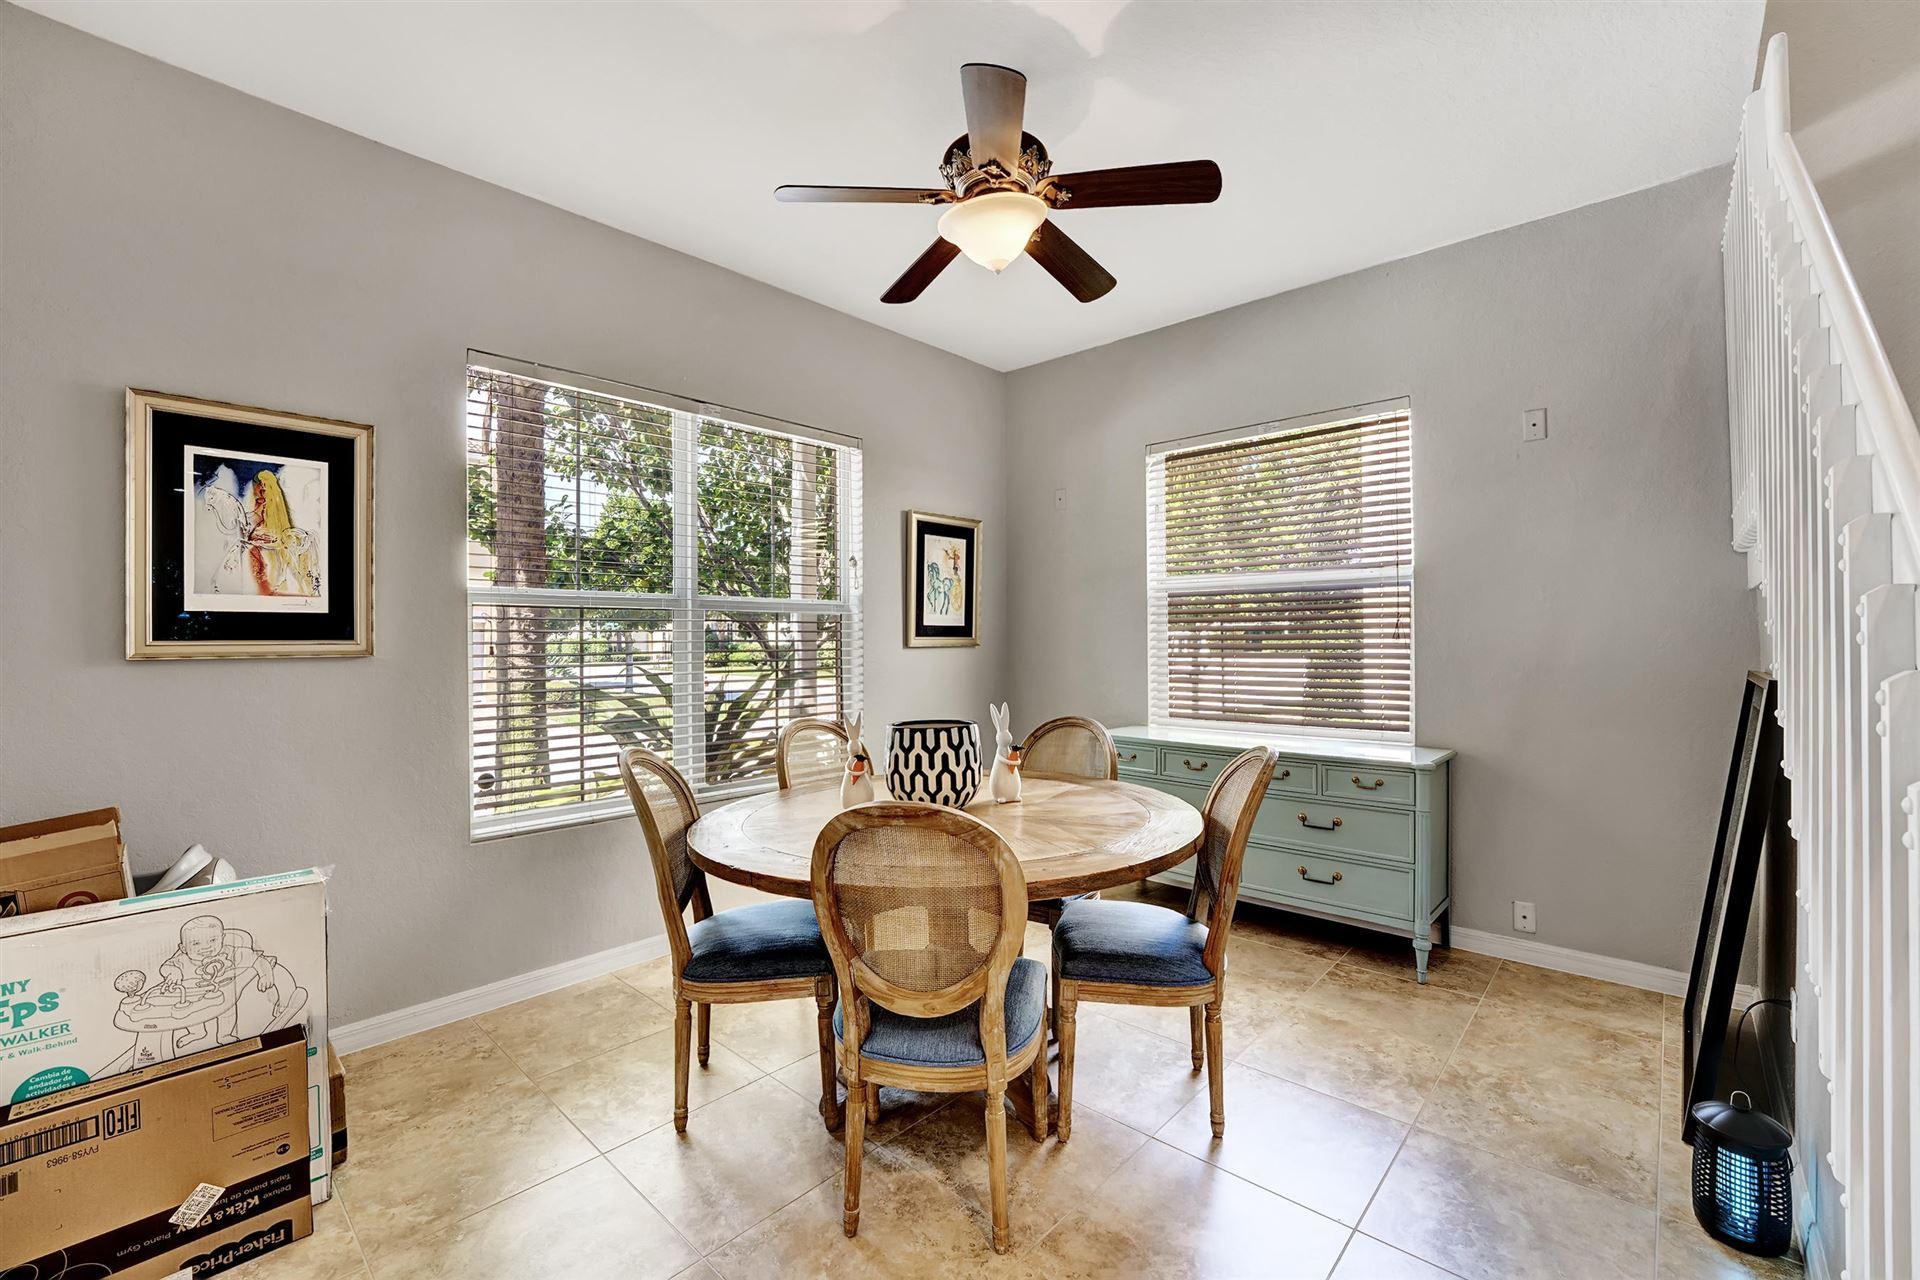 Photo of 452 Tiffany Oaks Way, Boynton Beach, FL 33435 (MLS # RX-10715066)